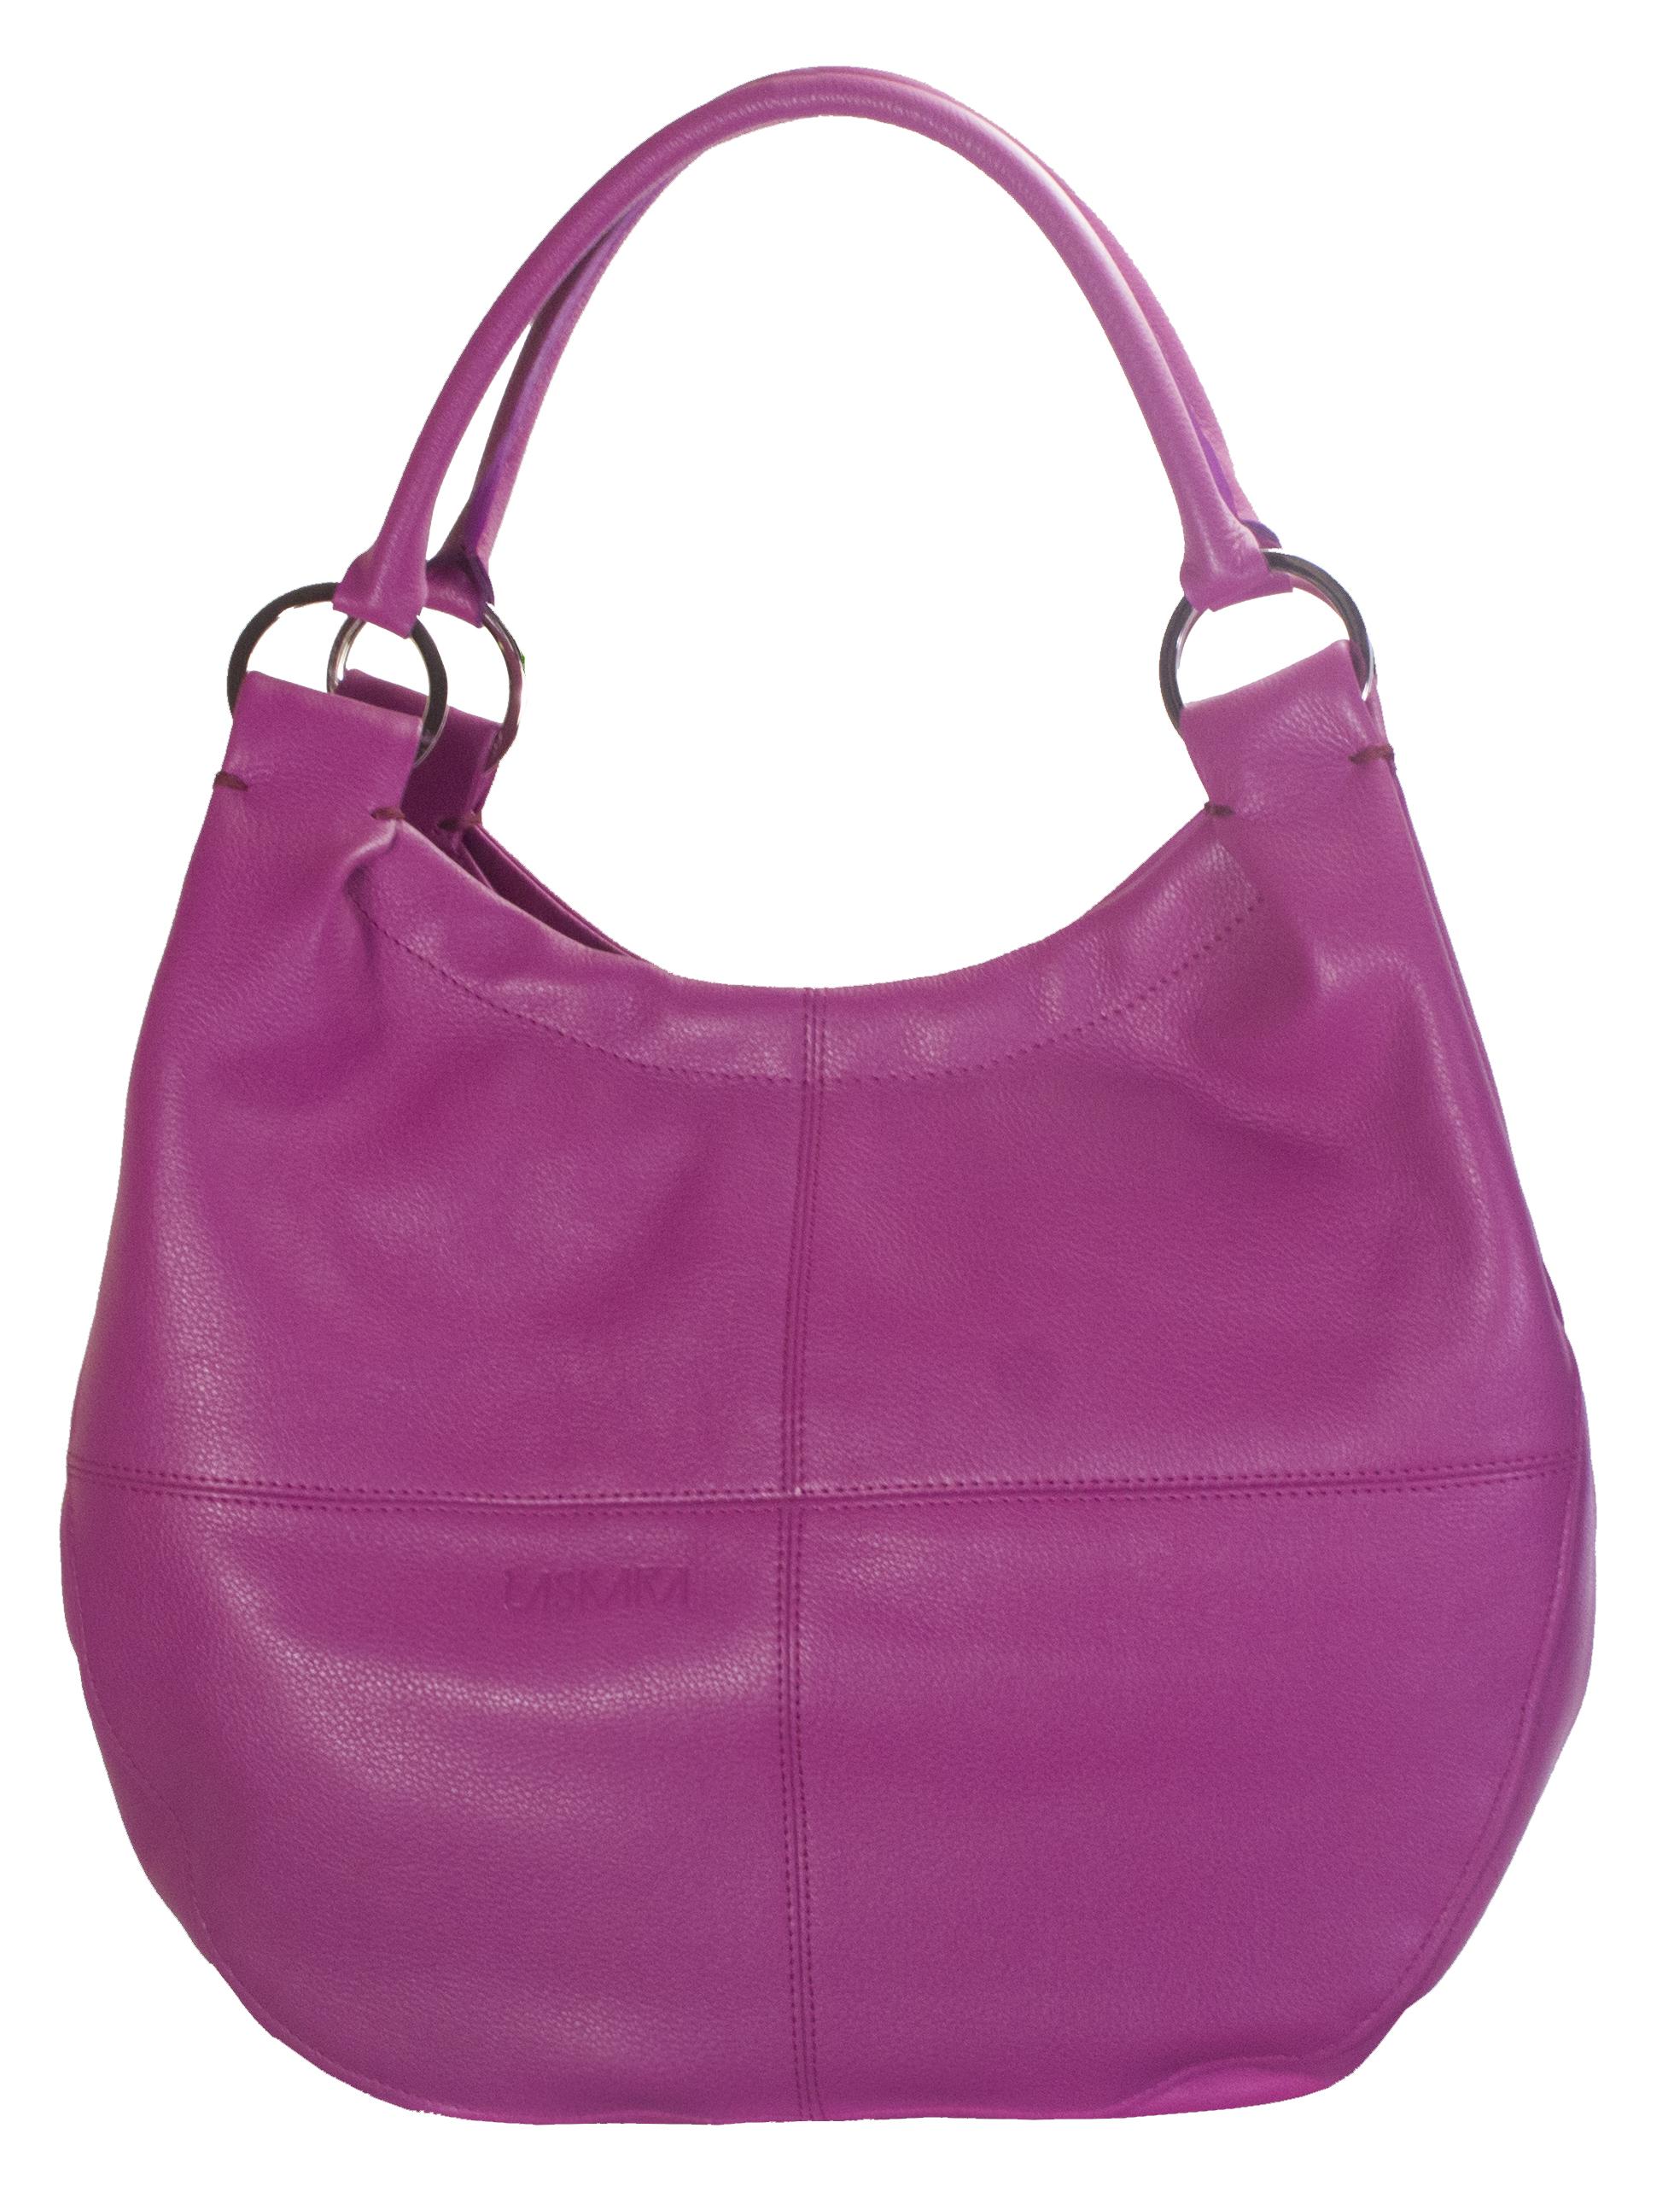 Kožená kabelka v malinové barvě 11-DS255-raspberry